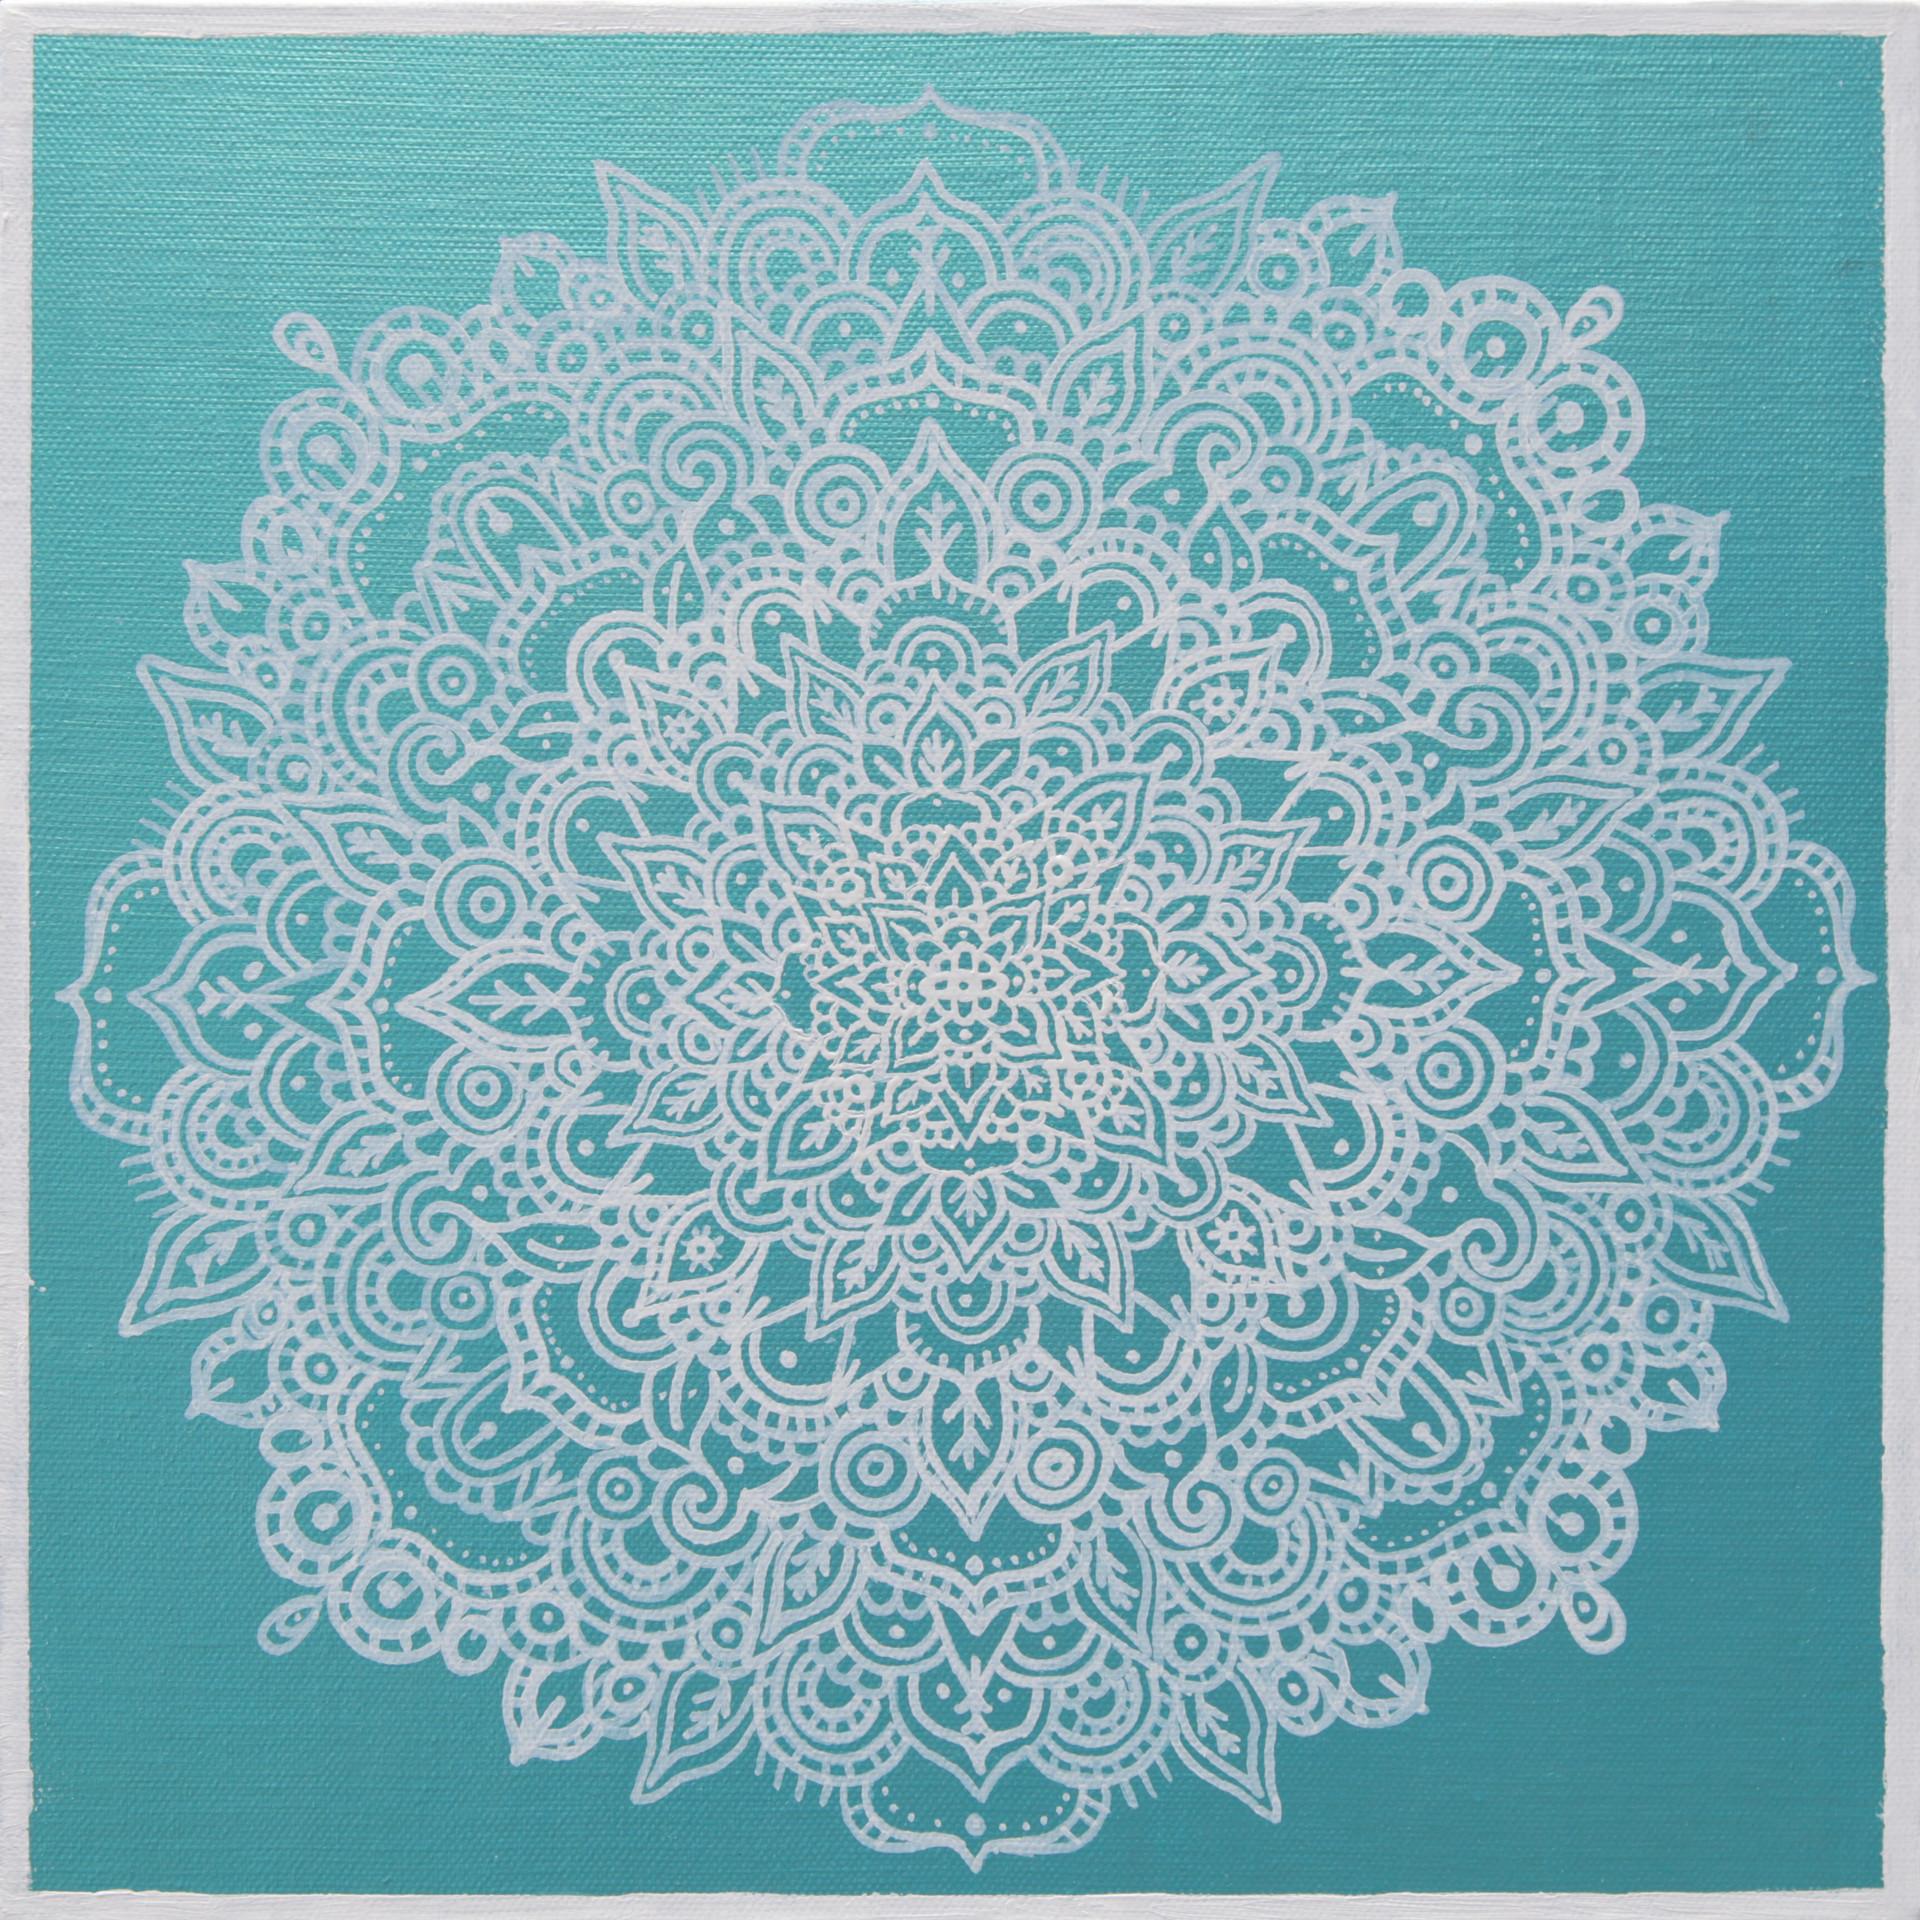 Fractal Flowers Series  30 x 30 cm  pen,acrylic on canvas_